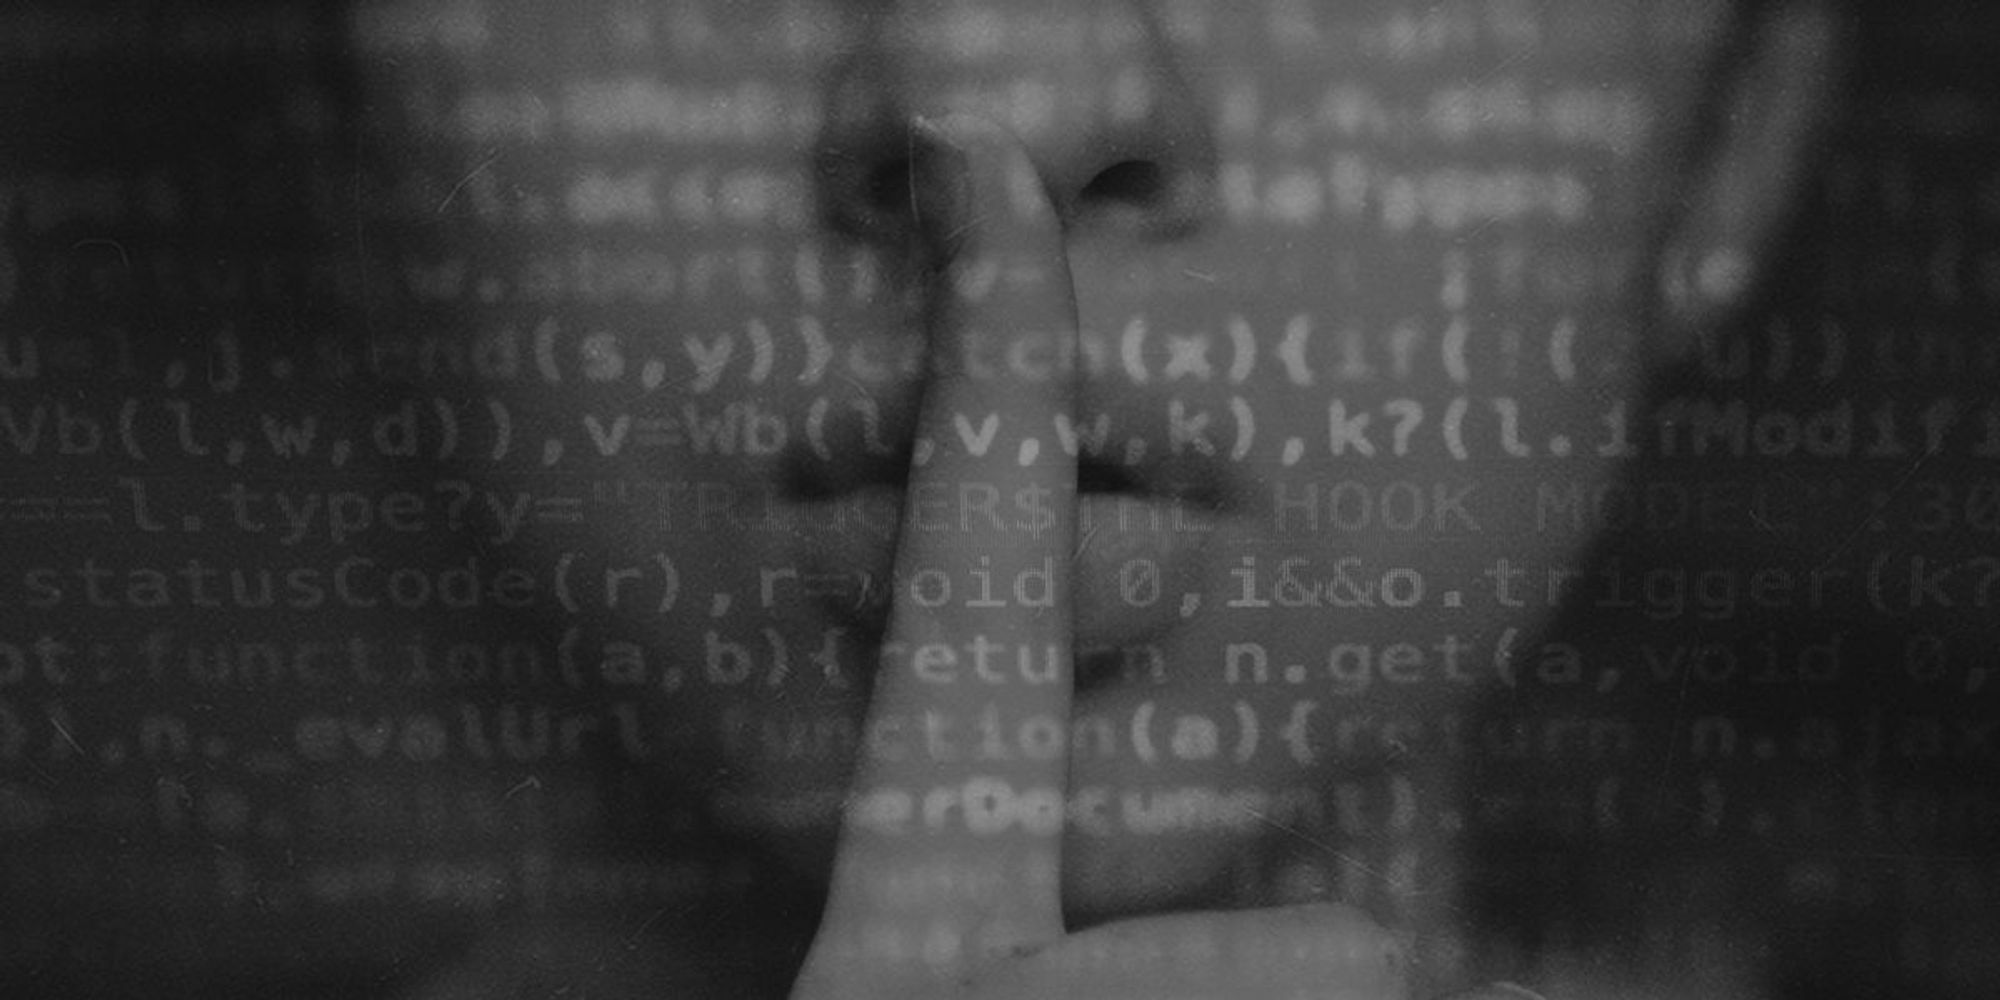 A wall of silence holding back racial progress in tech: NDAs